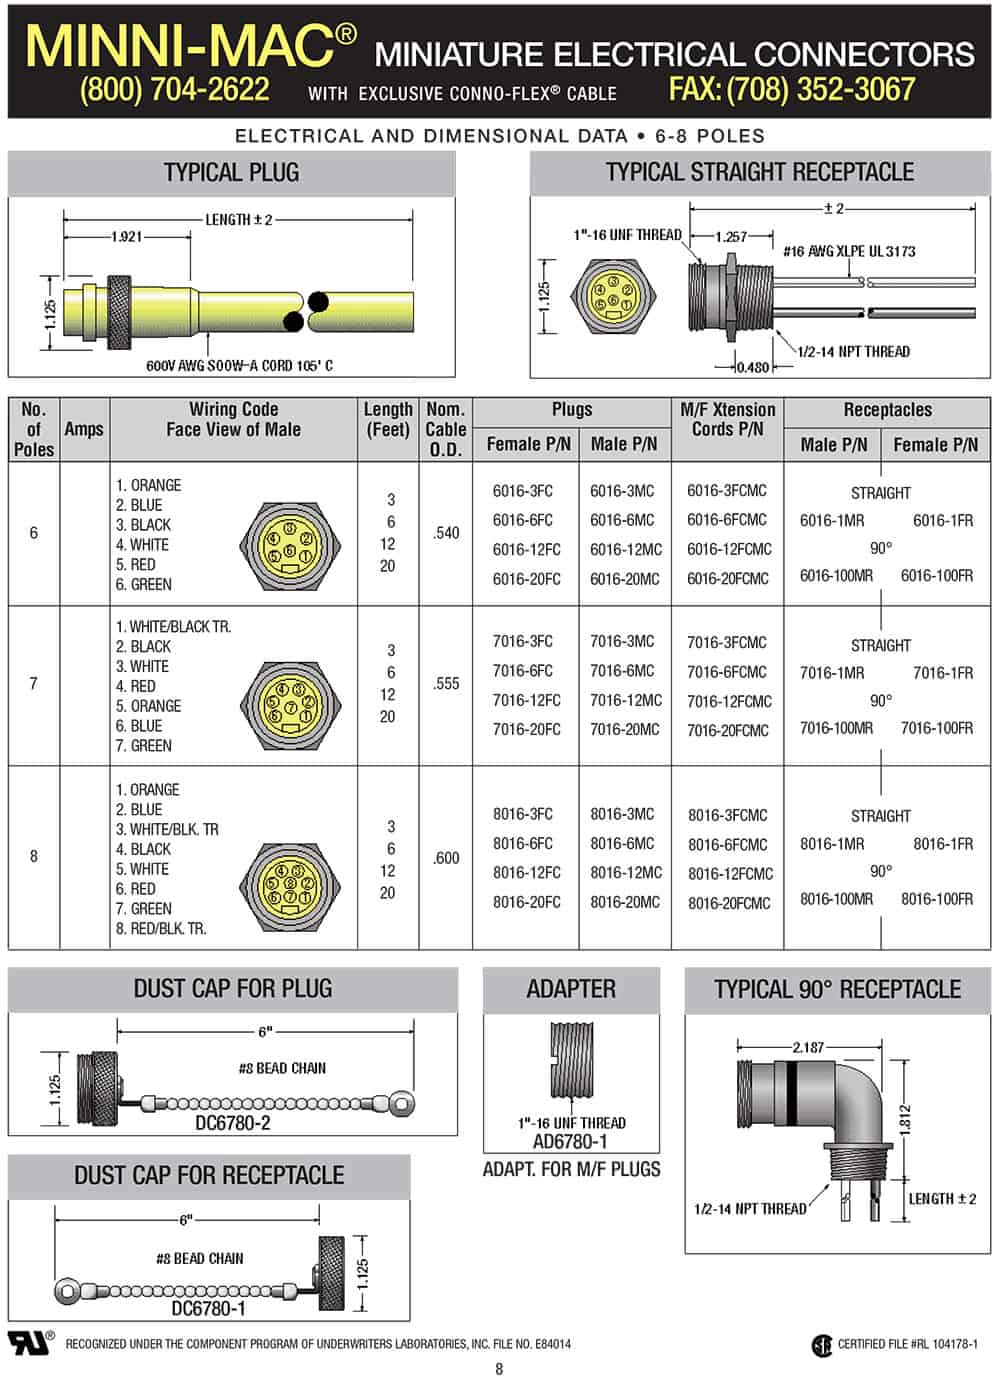 Miniature Electrical Connectors Diagrams and Measurements